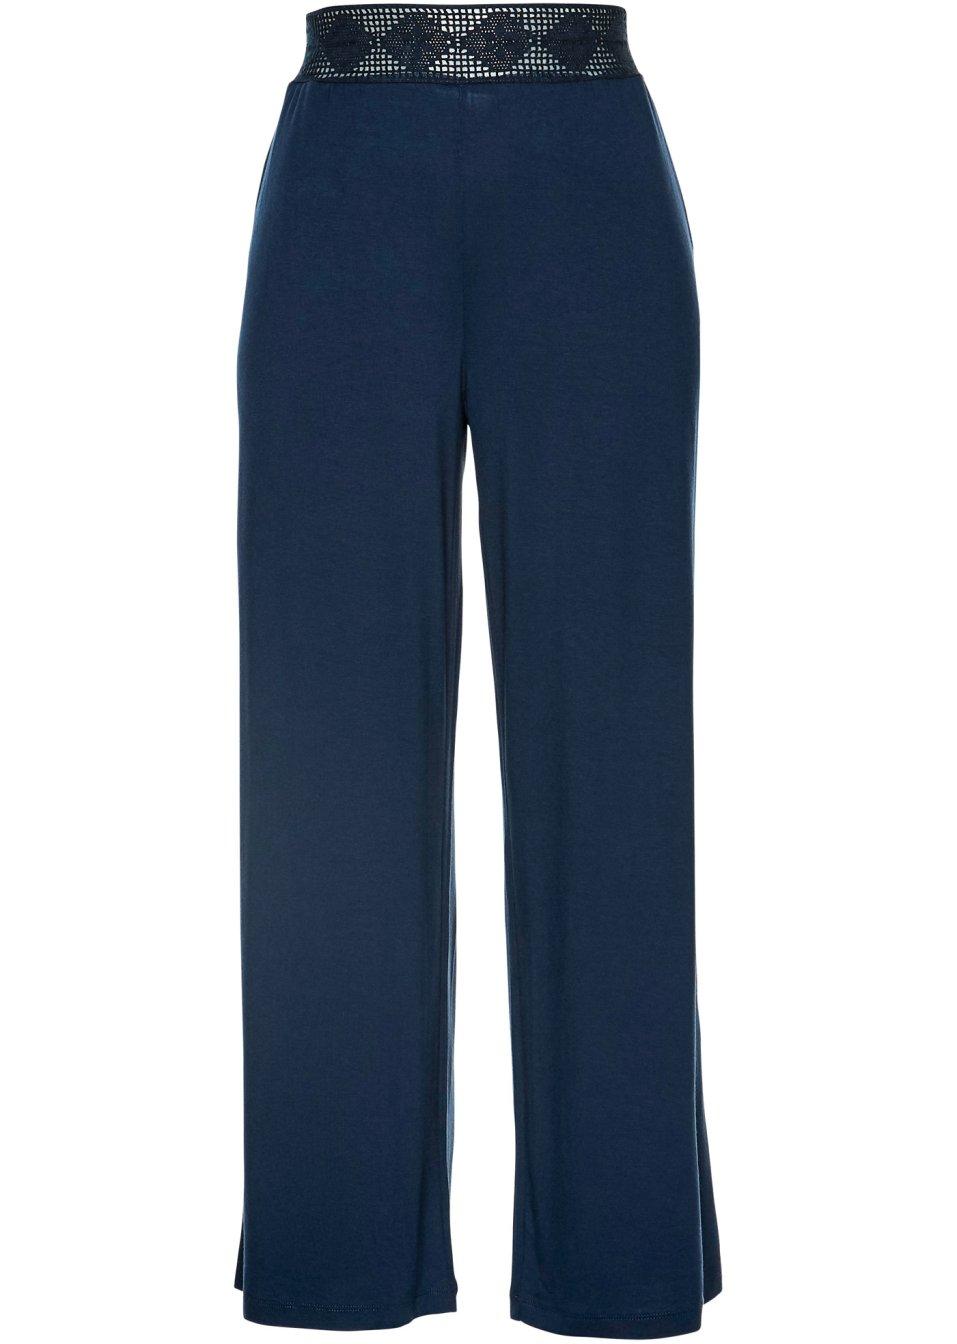 Jersey-Hose dunkelblau - bpc selection - bonprix.de 2QGna ke4K8